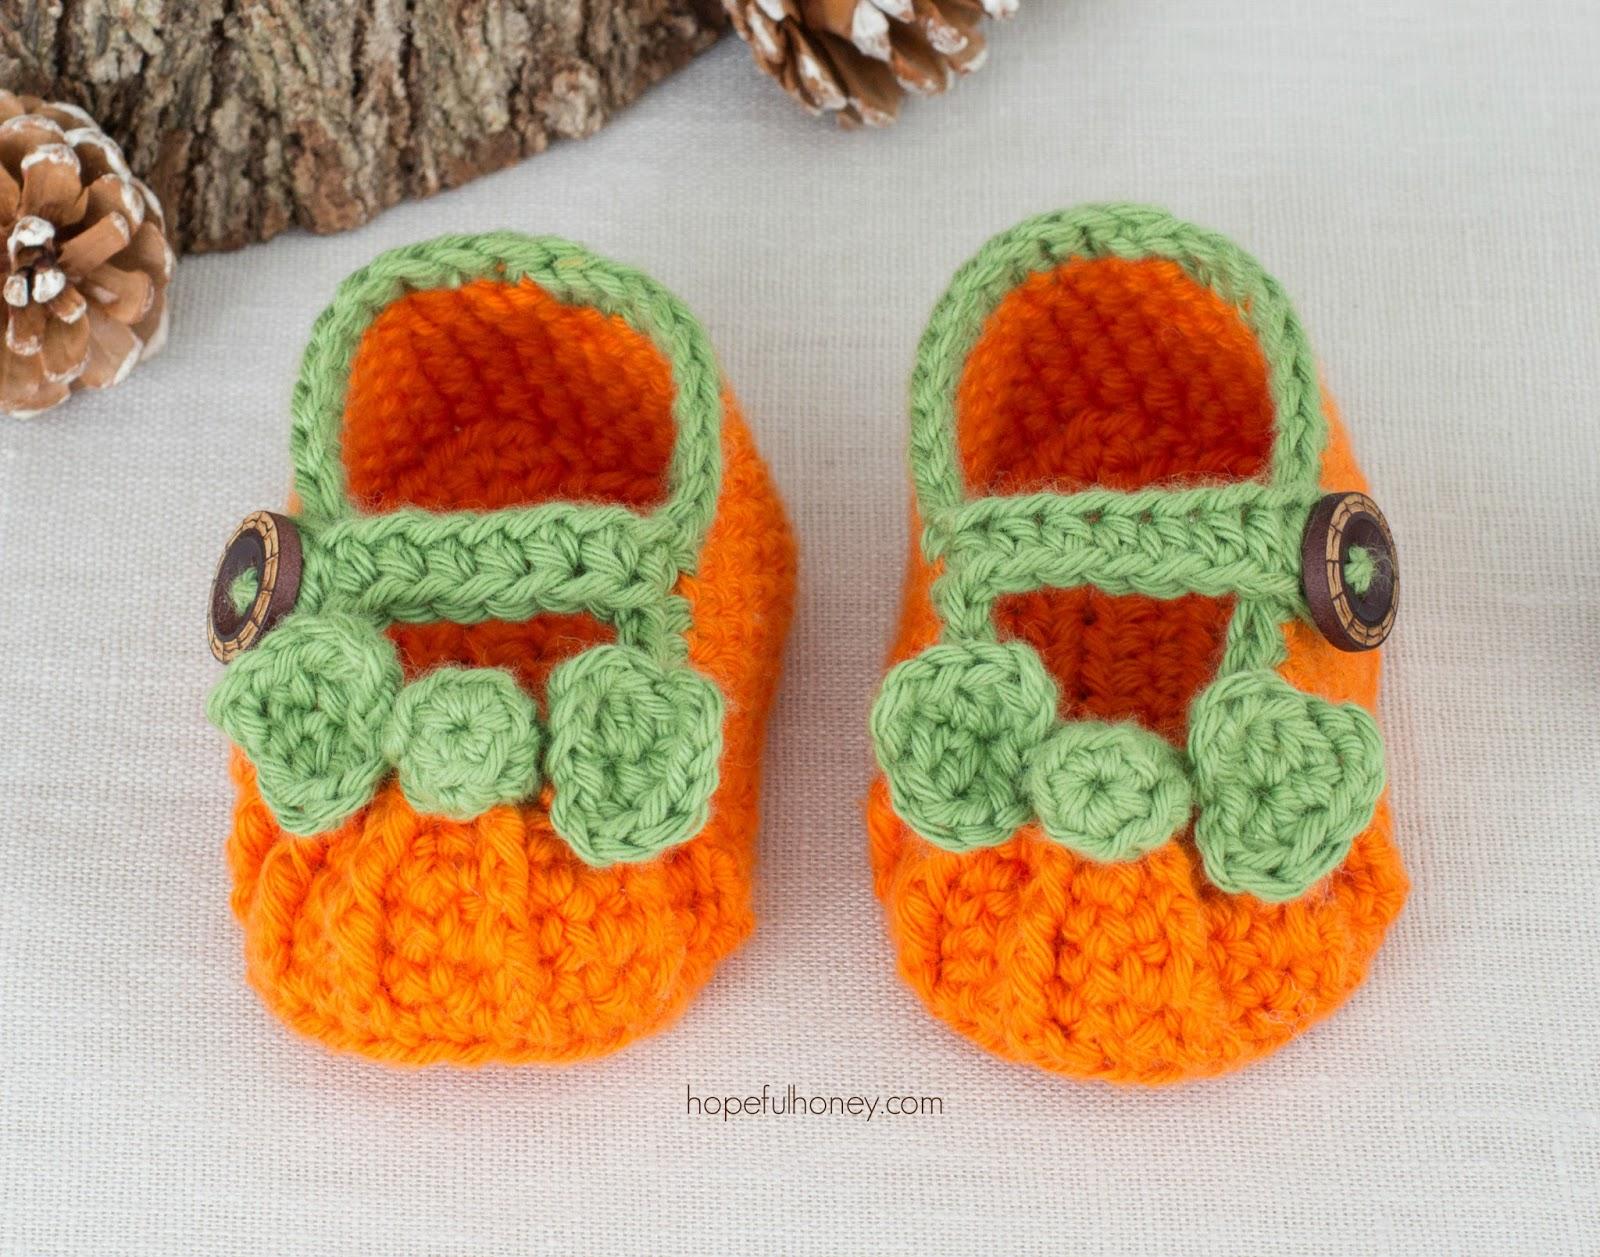 Baby Booties Crochet Pattern Dk Wool : Hopeful Honey Craft, Crochet, Create: Pumpkin Spice Baby ...